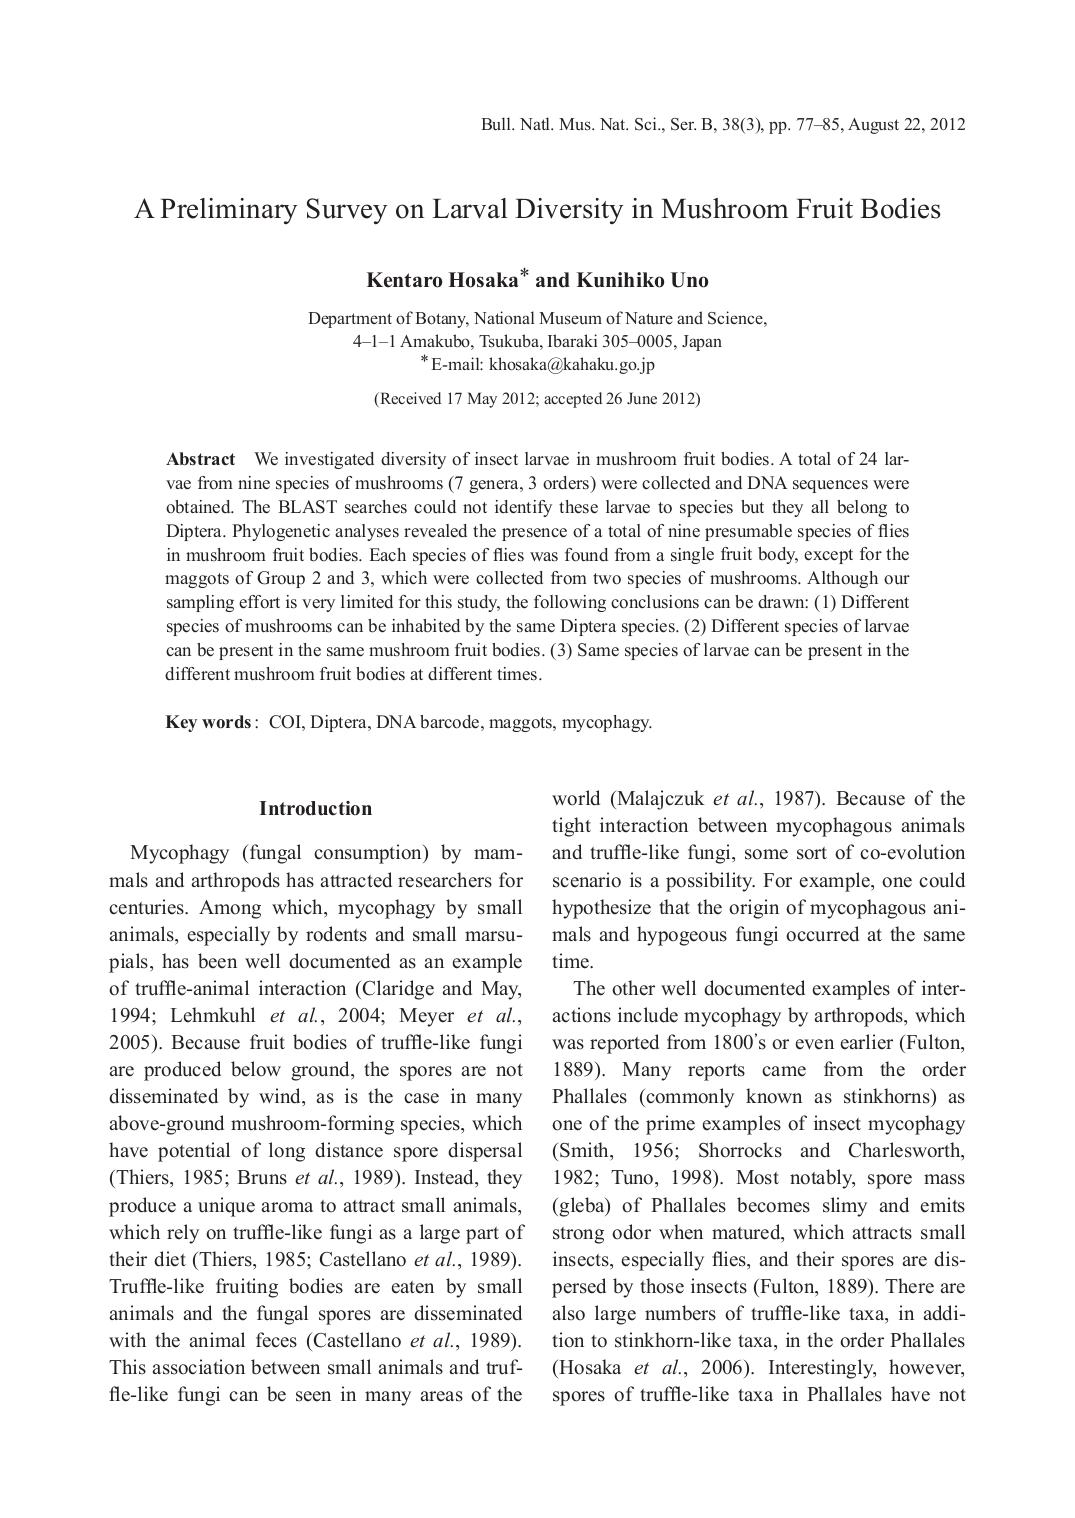 pdf for Nesco Other FD-39 Food Dehydrator manual